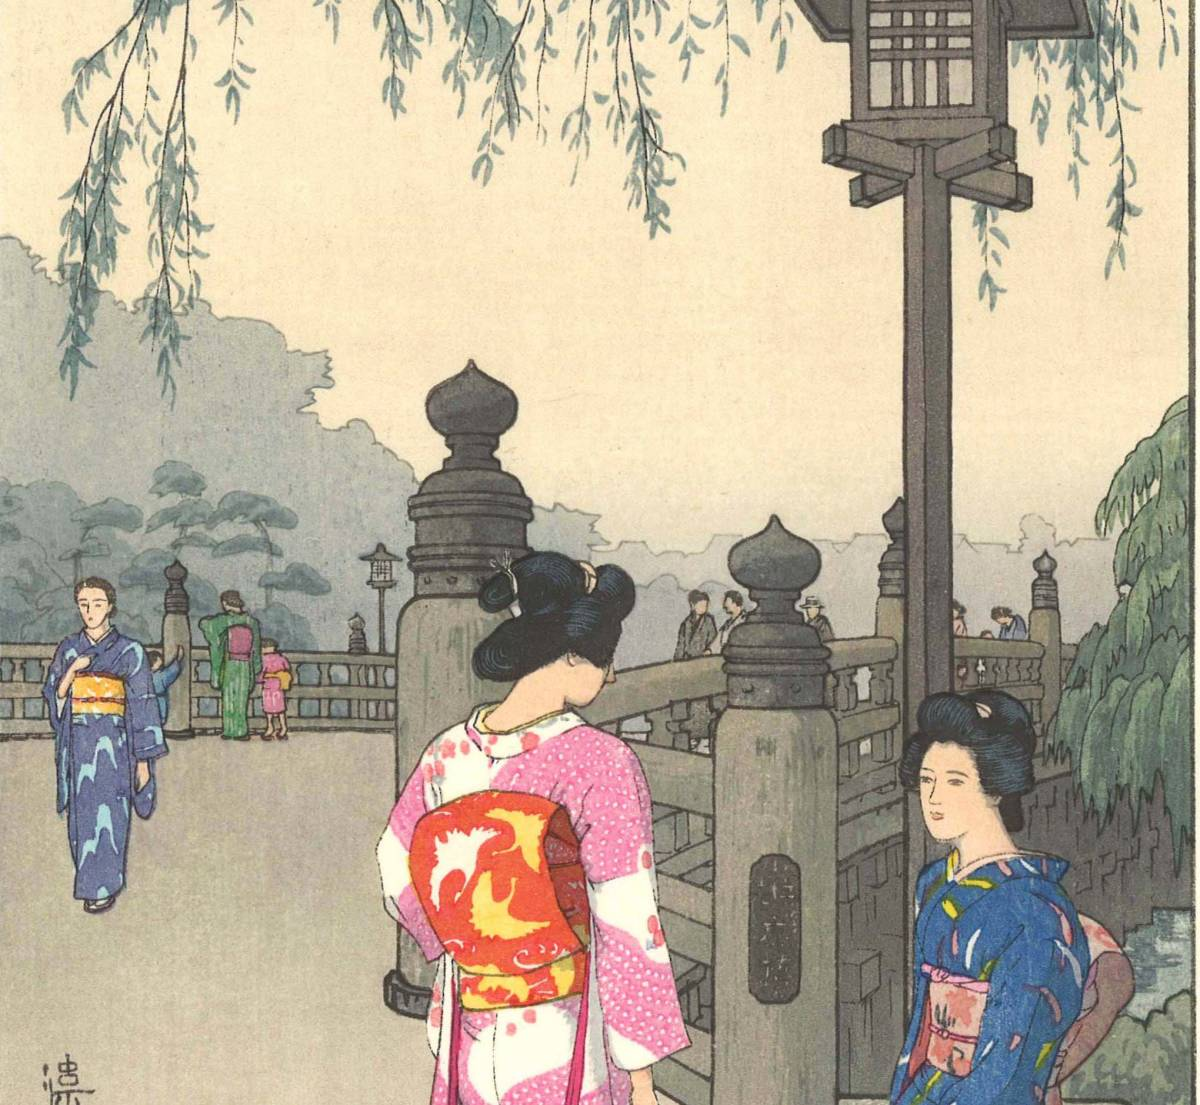 吉田遠志 木版画  014103 弁慶橋 (Benkei Bridge)  初摺1941年    最高峰の摺師の技をご堪能下さい!!_画像6